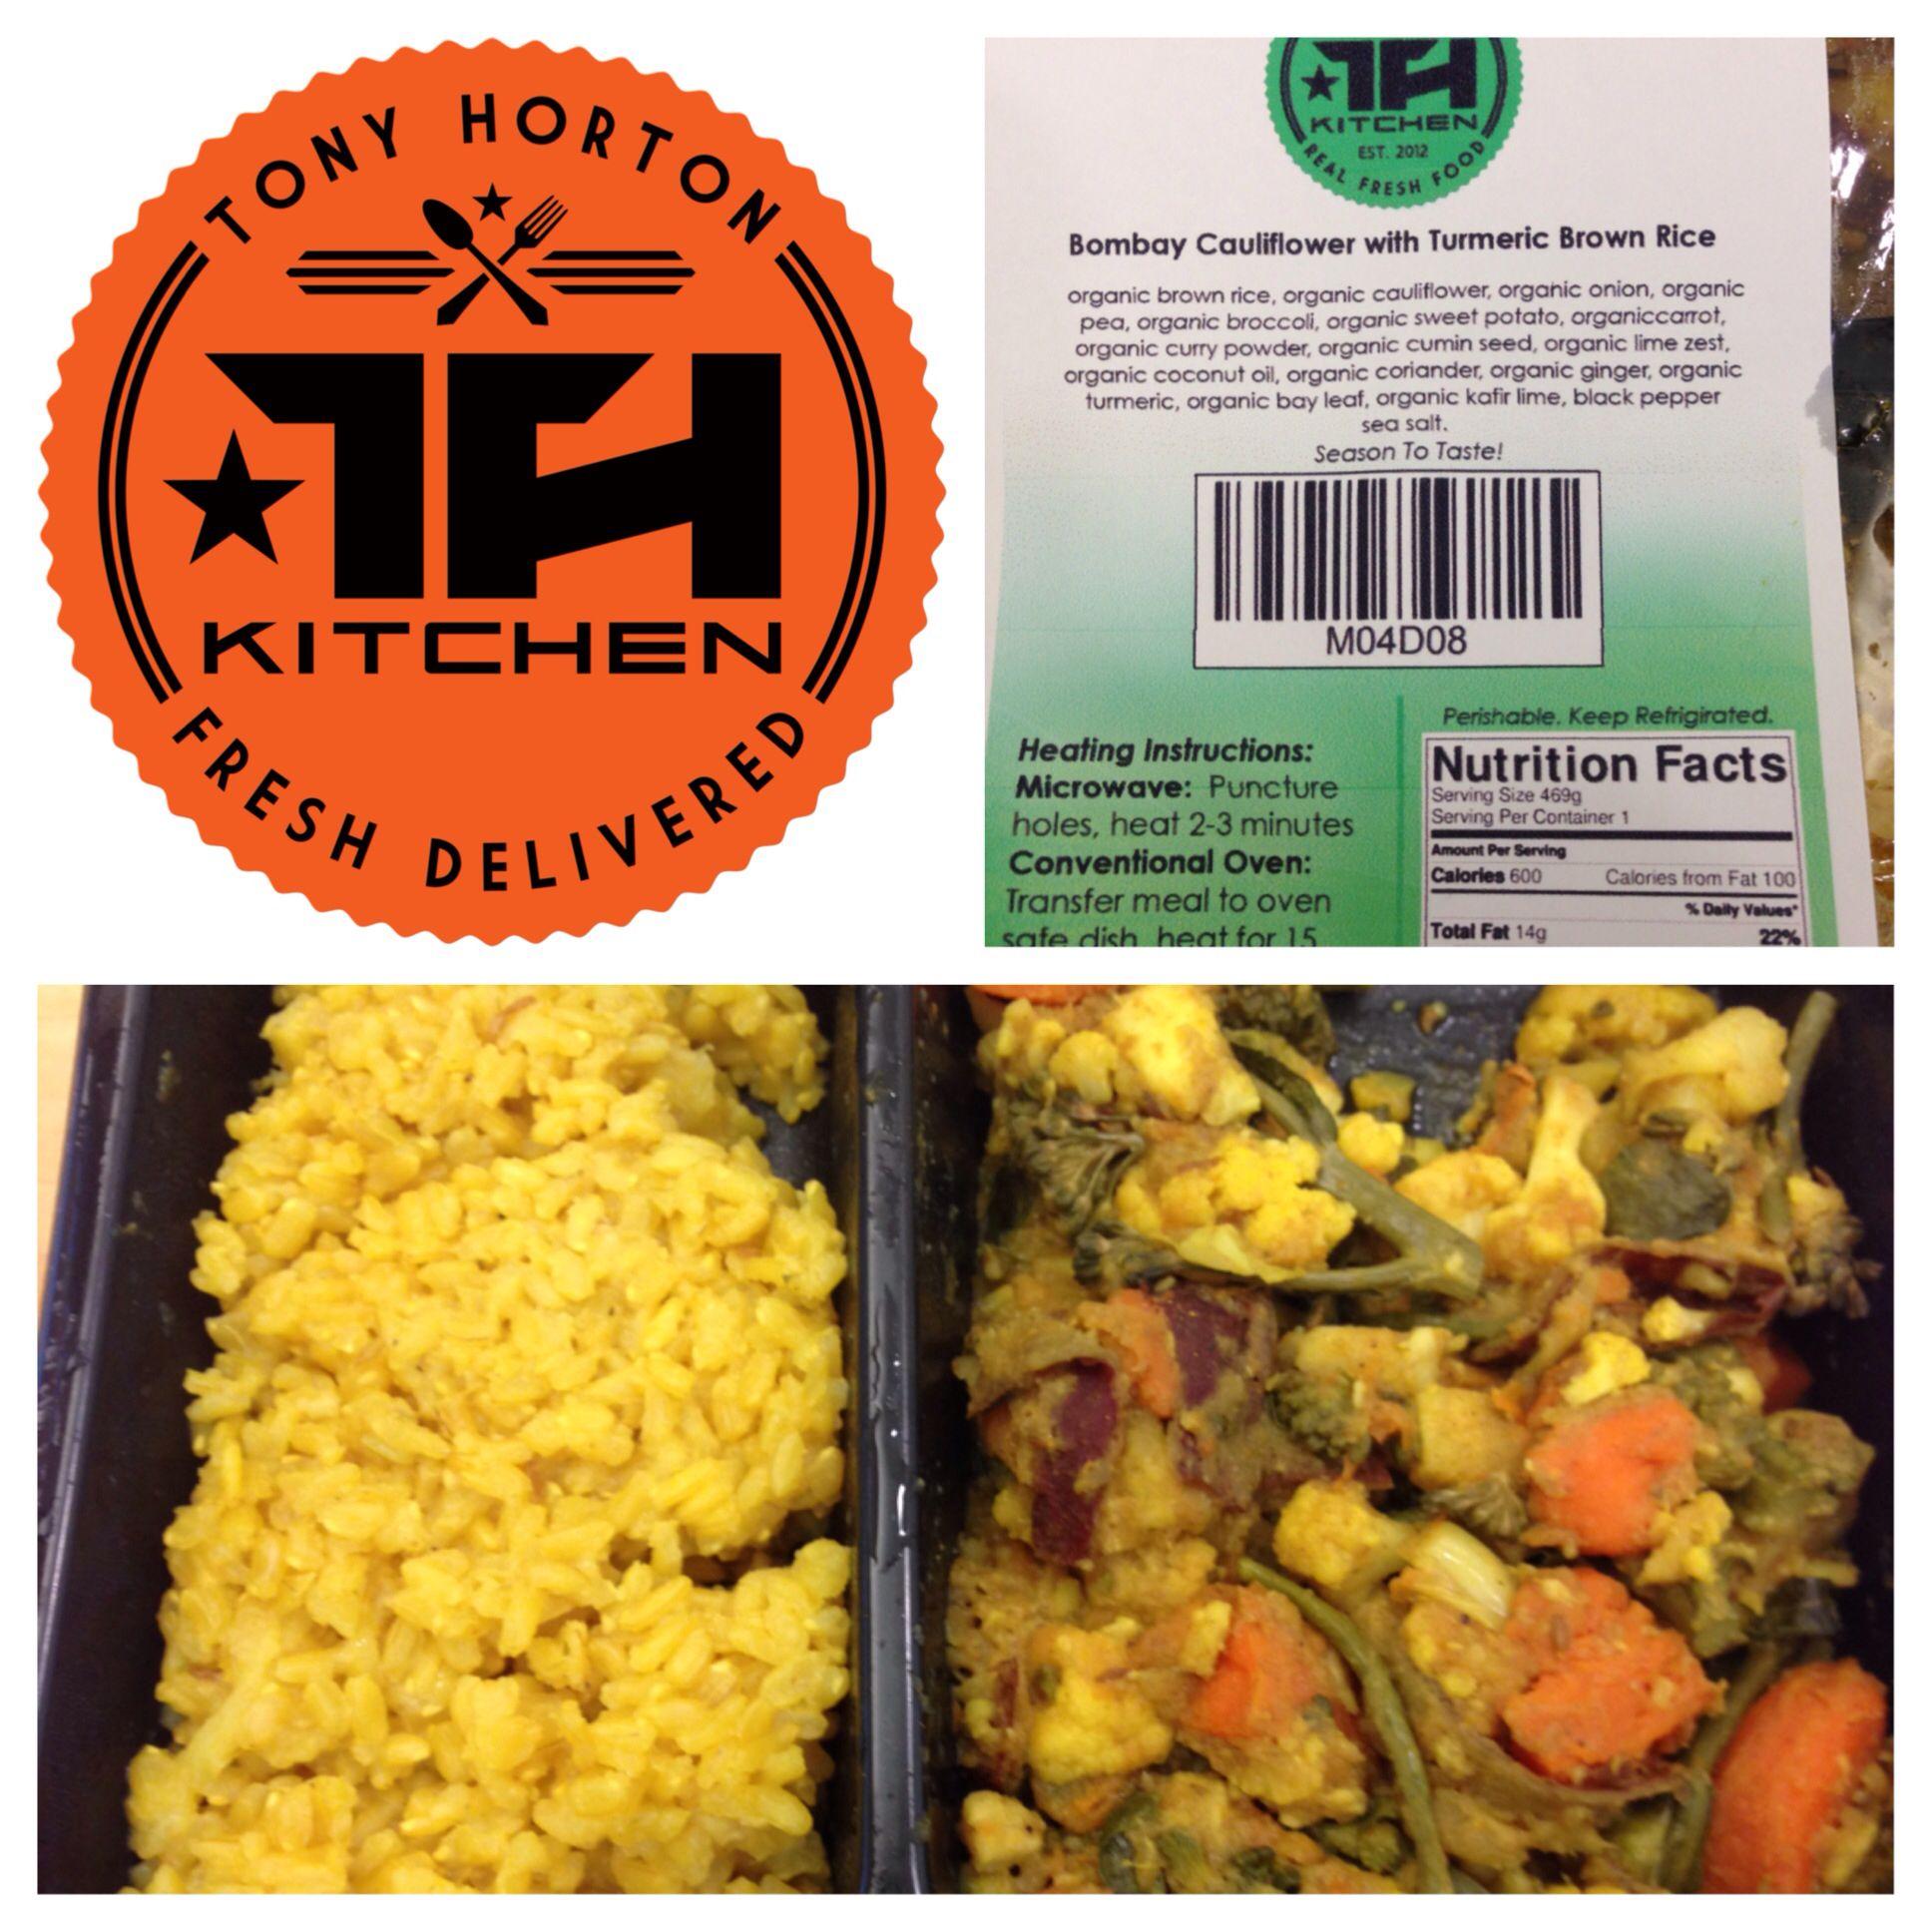 Tony Horton Kitchen - Bombay cauliflower with turmeric brown rice ...